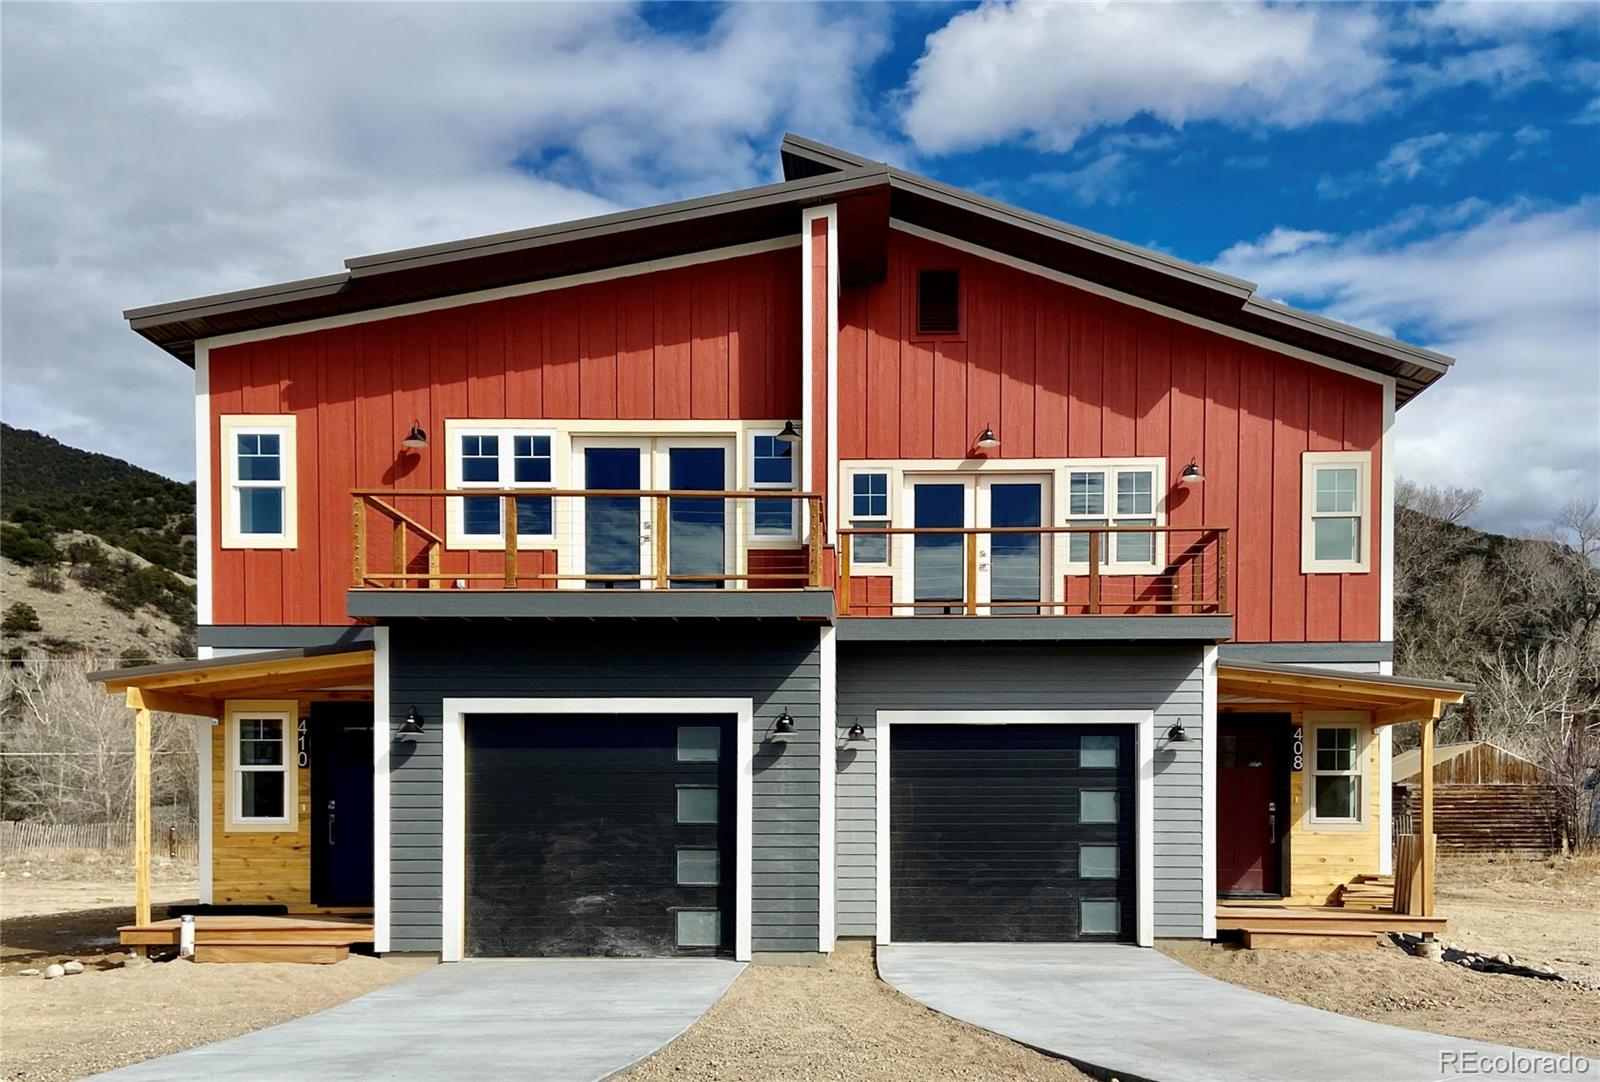 408 Eddy Lane Property Photo - Salida, CO real estate listing